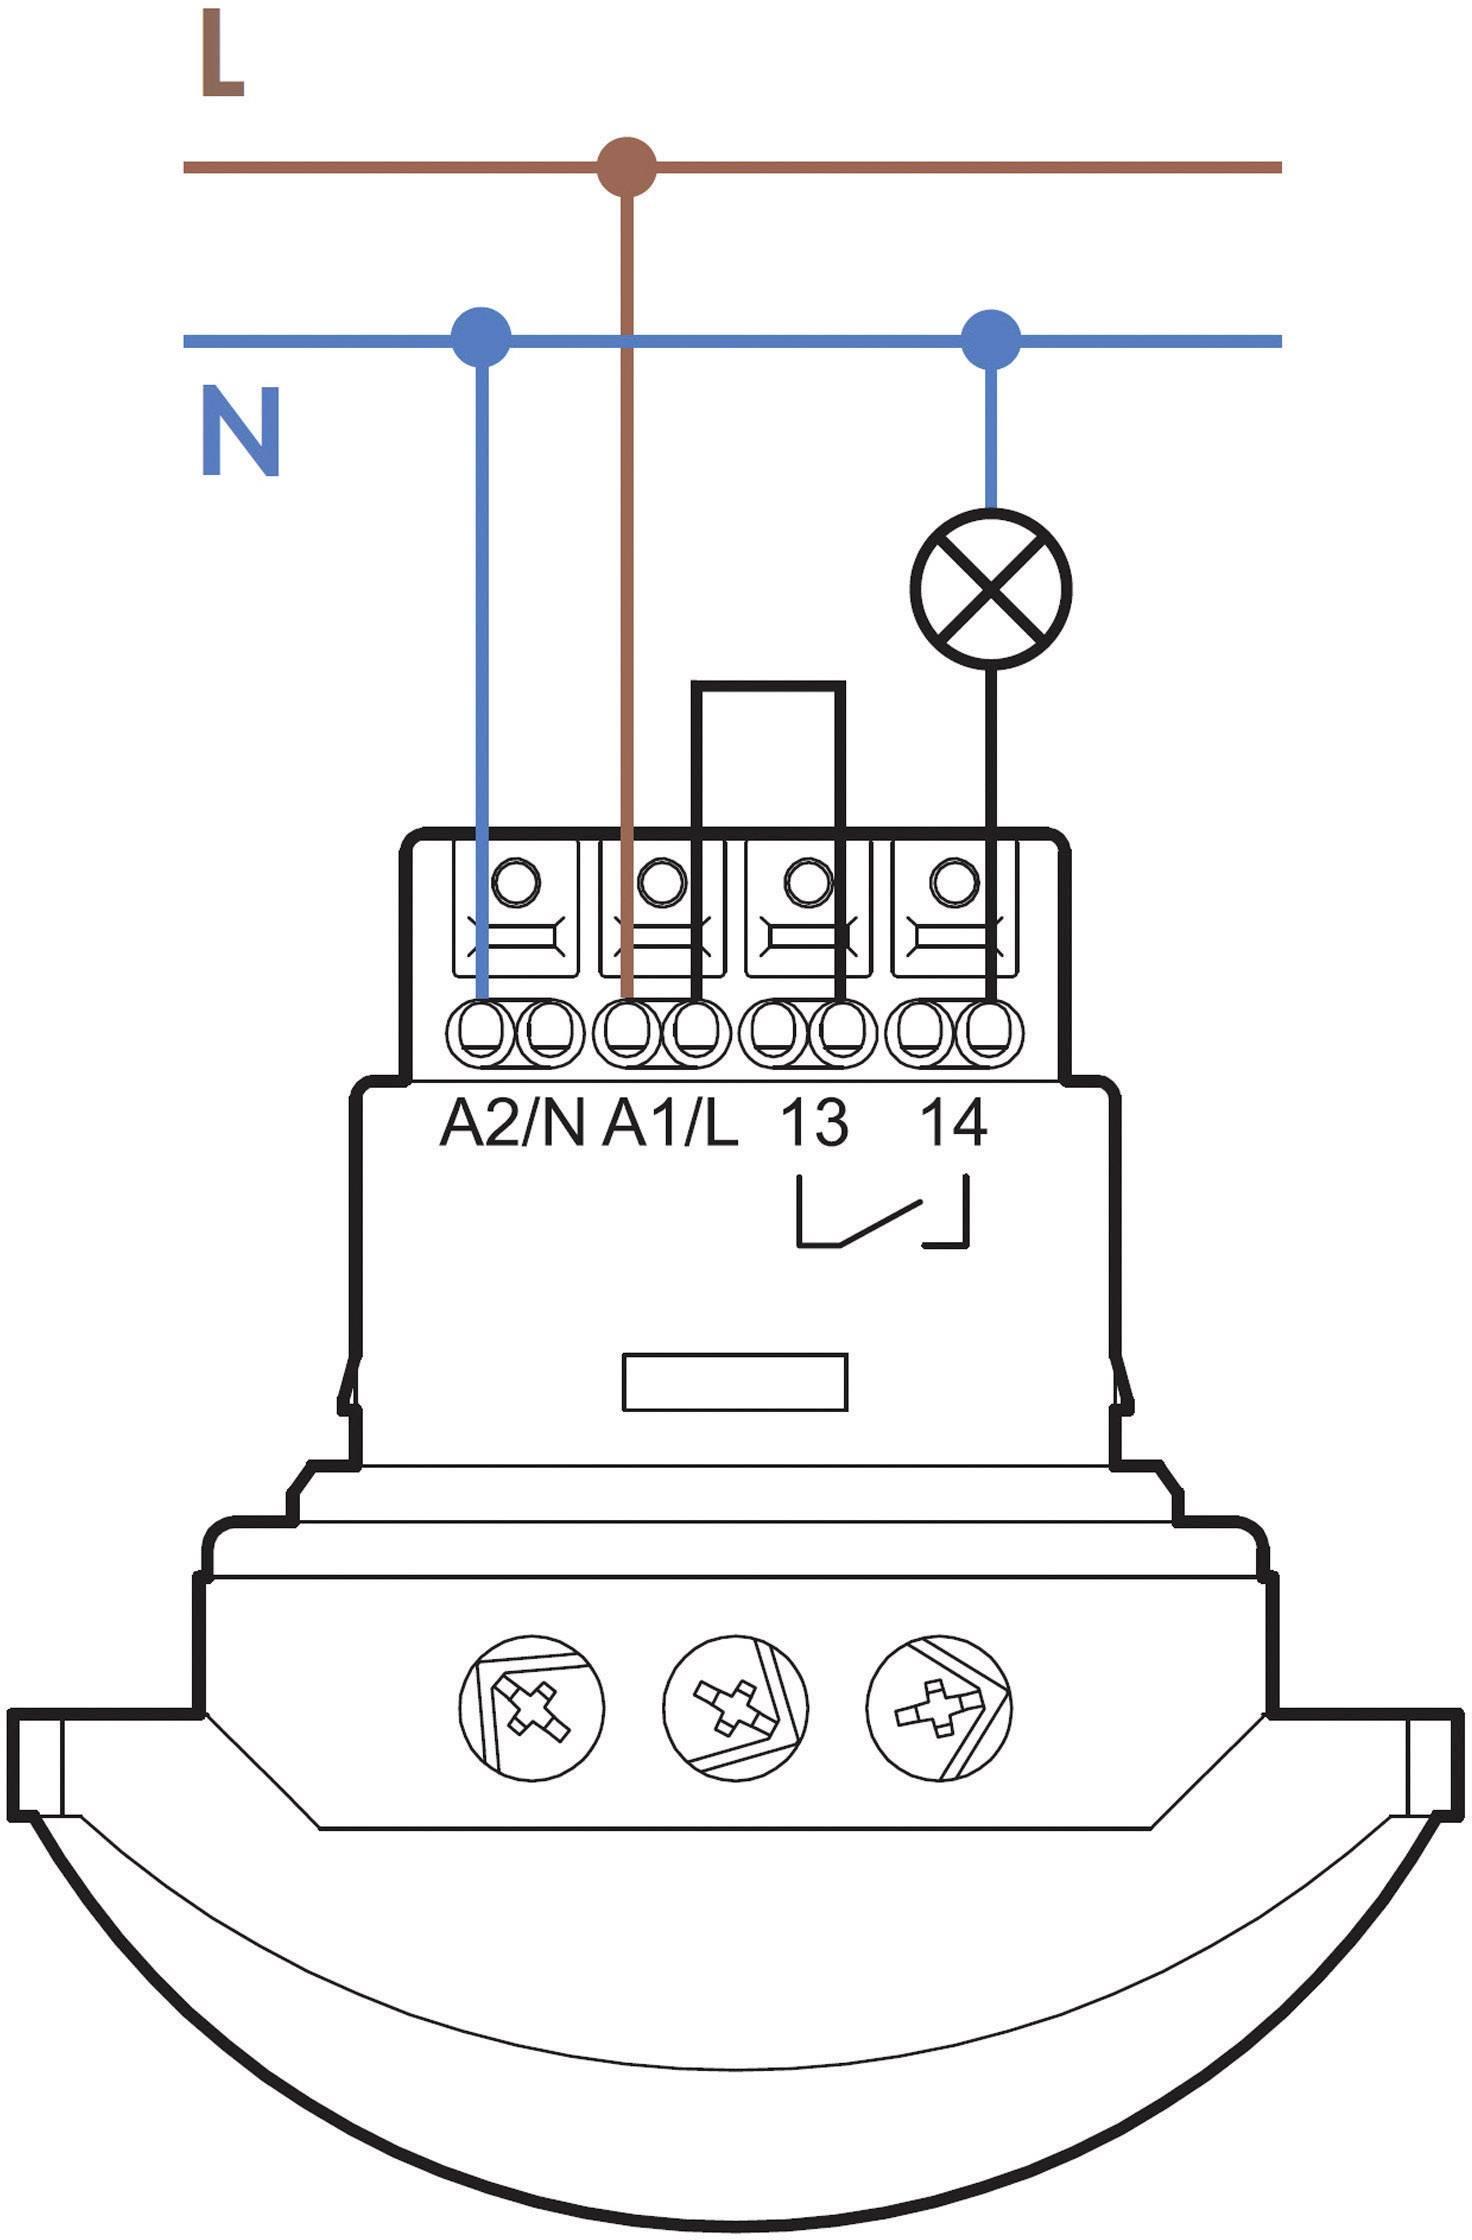 Detektor pohybu Finder 18.41.8.230.0300, 250 V/AC, Max. dosah 30 m